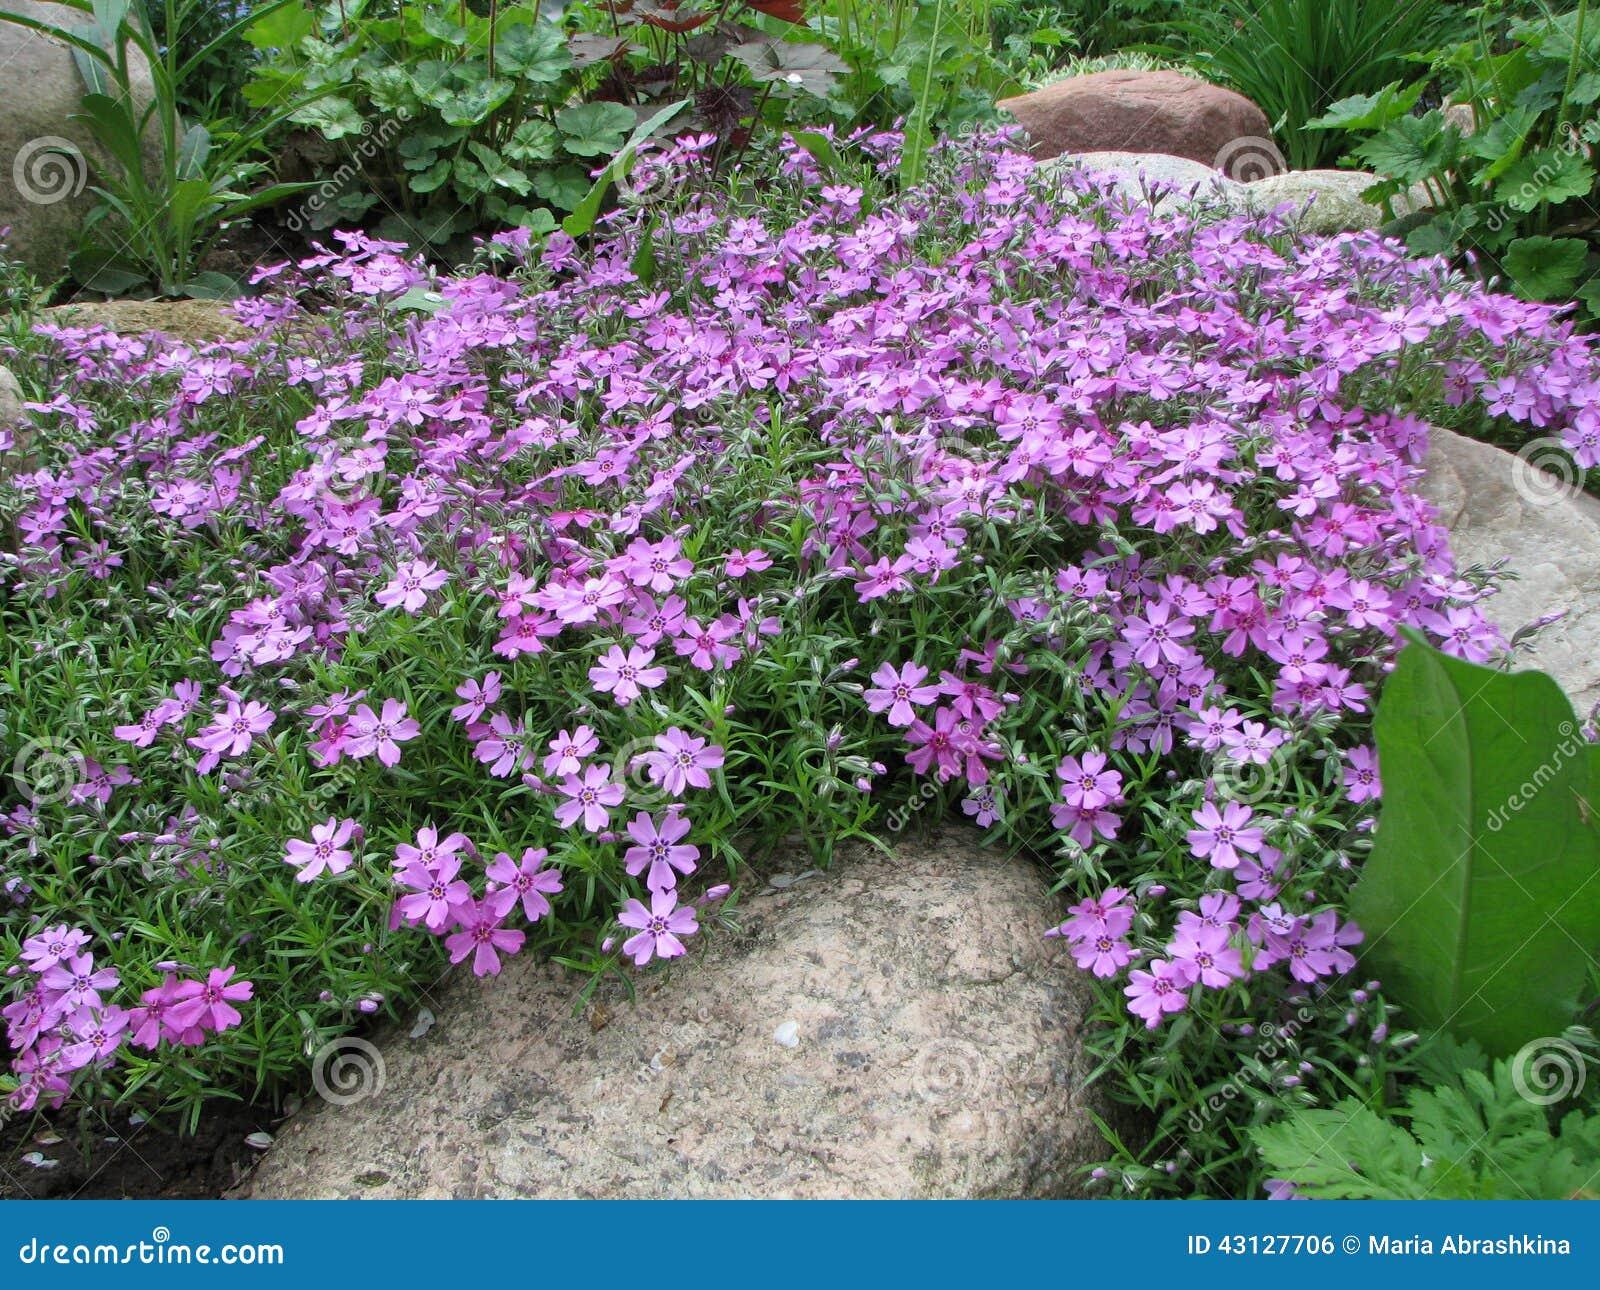 styloid flowering phlox phlox subulata stock photo image of buds flora 43127706. Black Bedroom Furniture Sets. Home Design Ideas